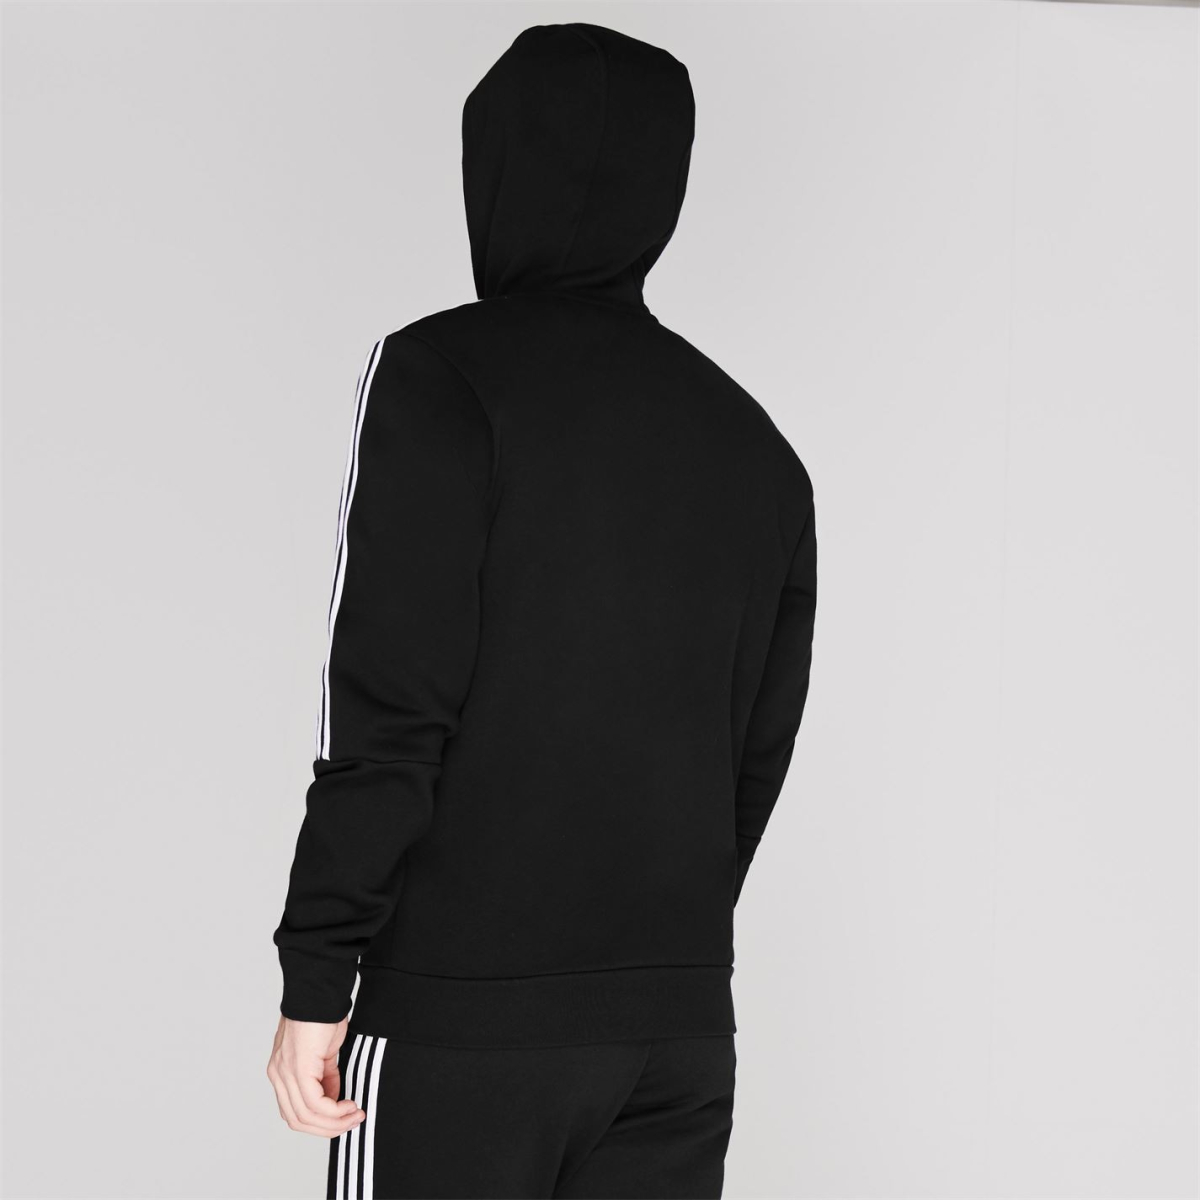 adidas 3 Streifen Kapuzenjacke Jacke Herren Sweatshirt Kapuzenpullover 3033